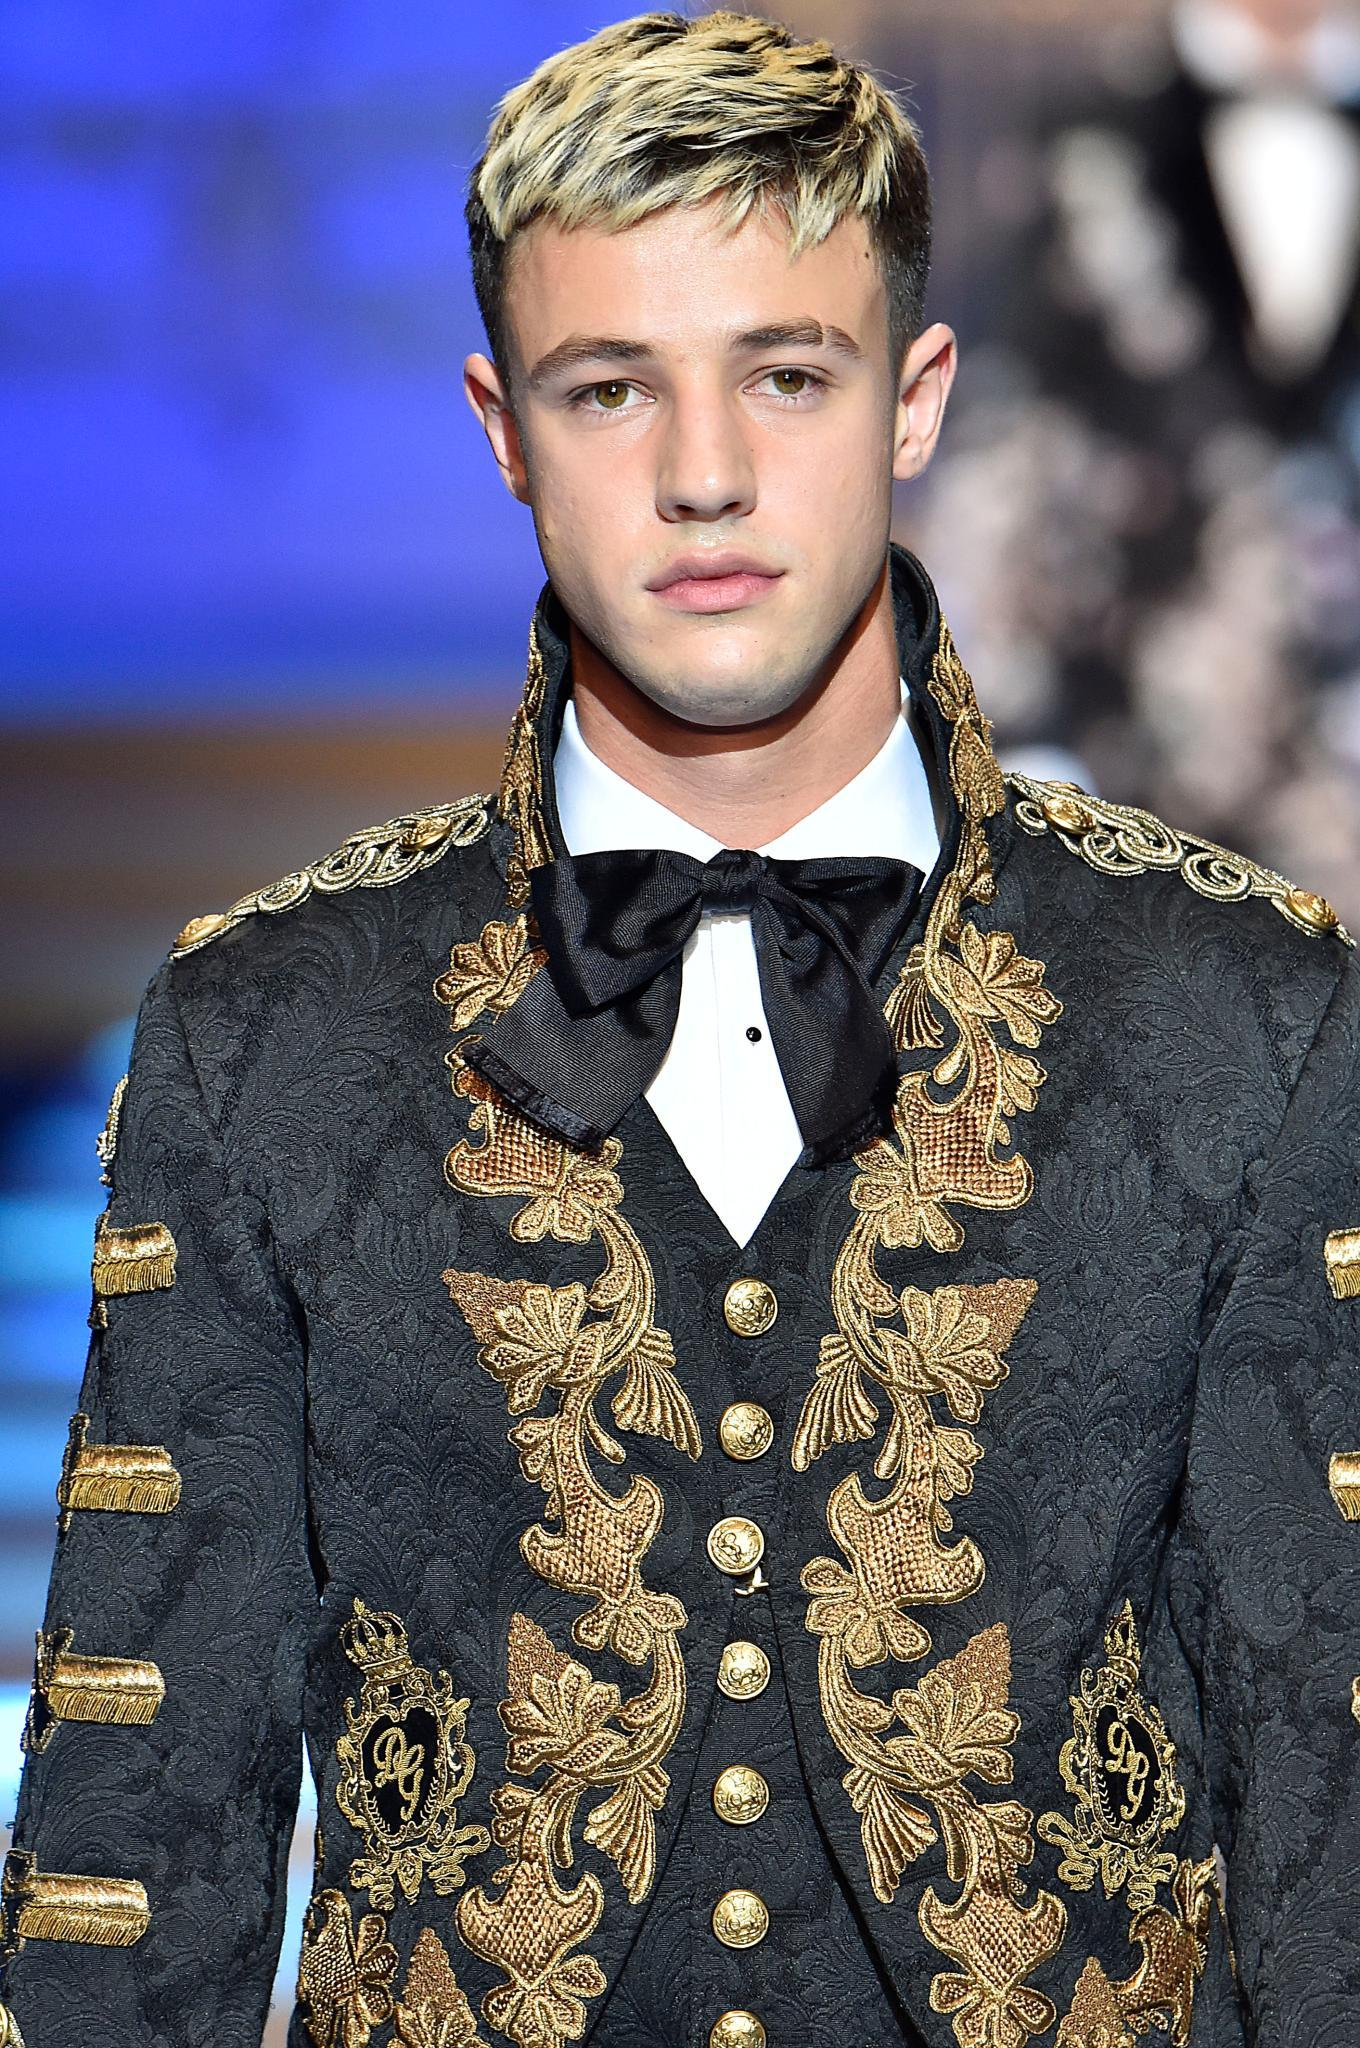 a male fashion model with short undercut on a runway